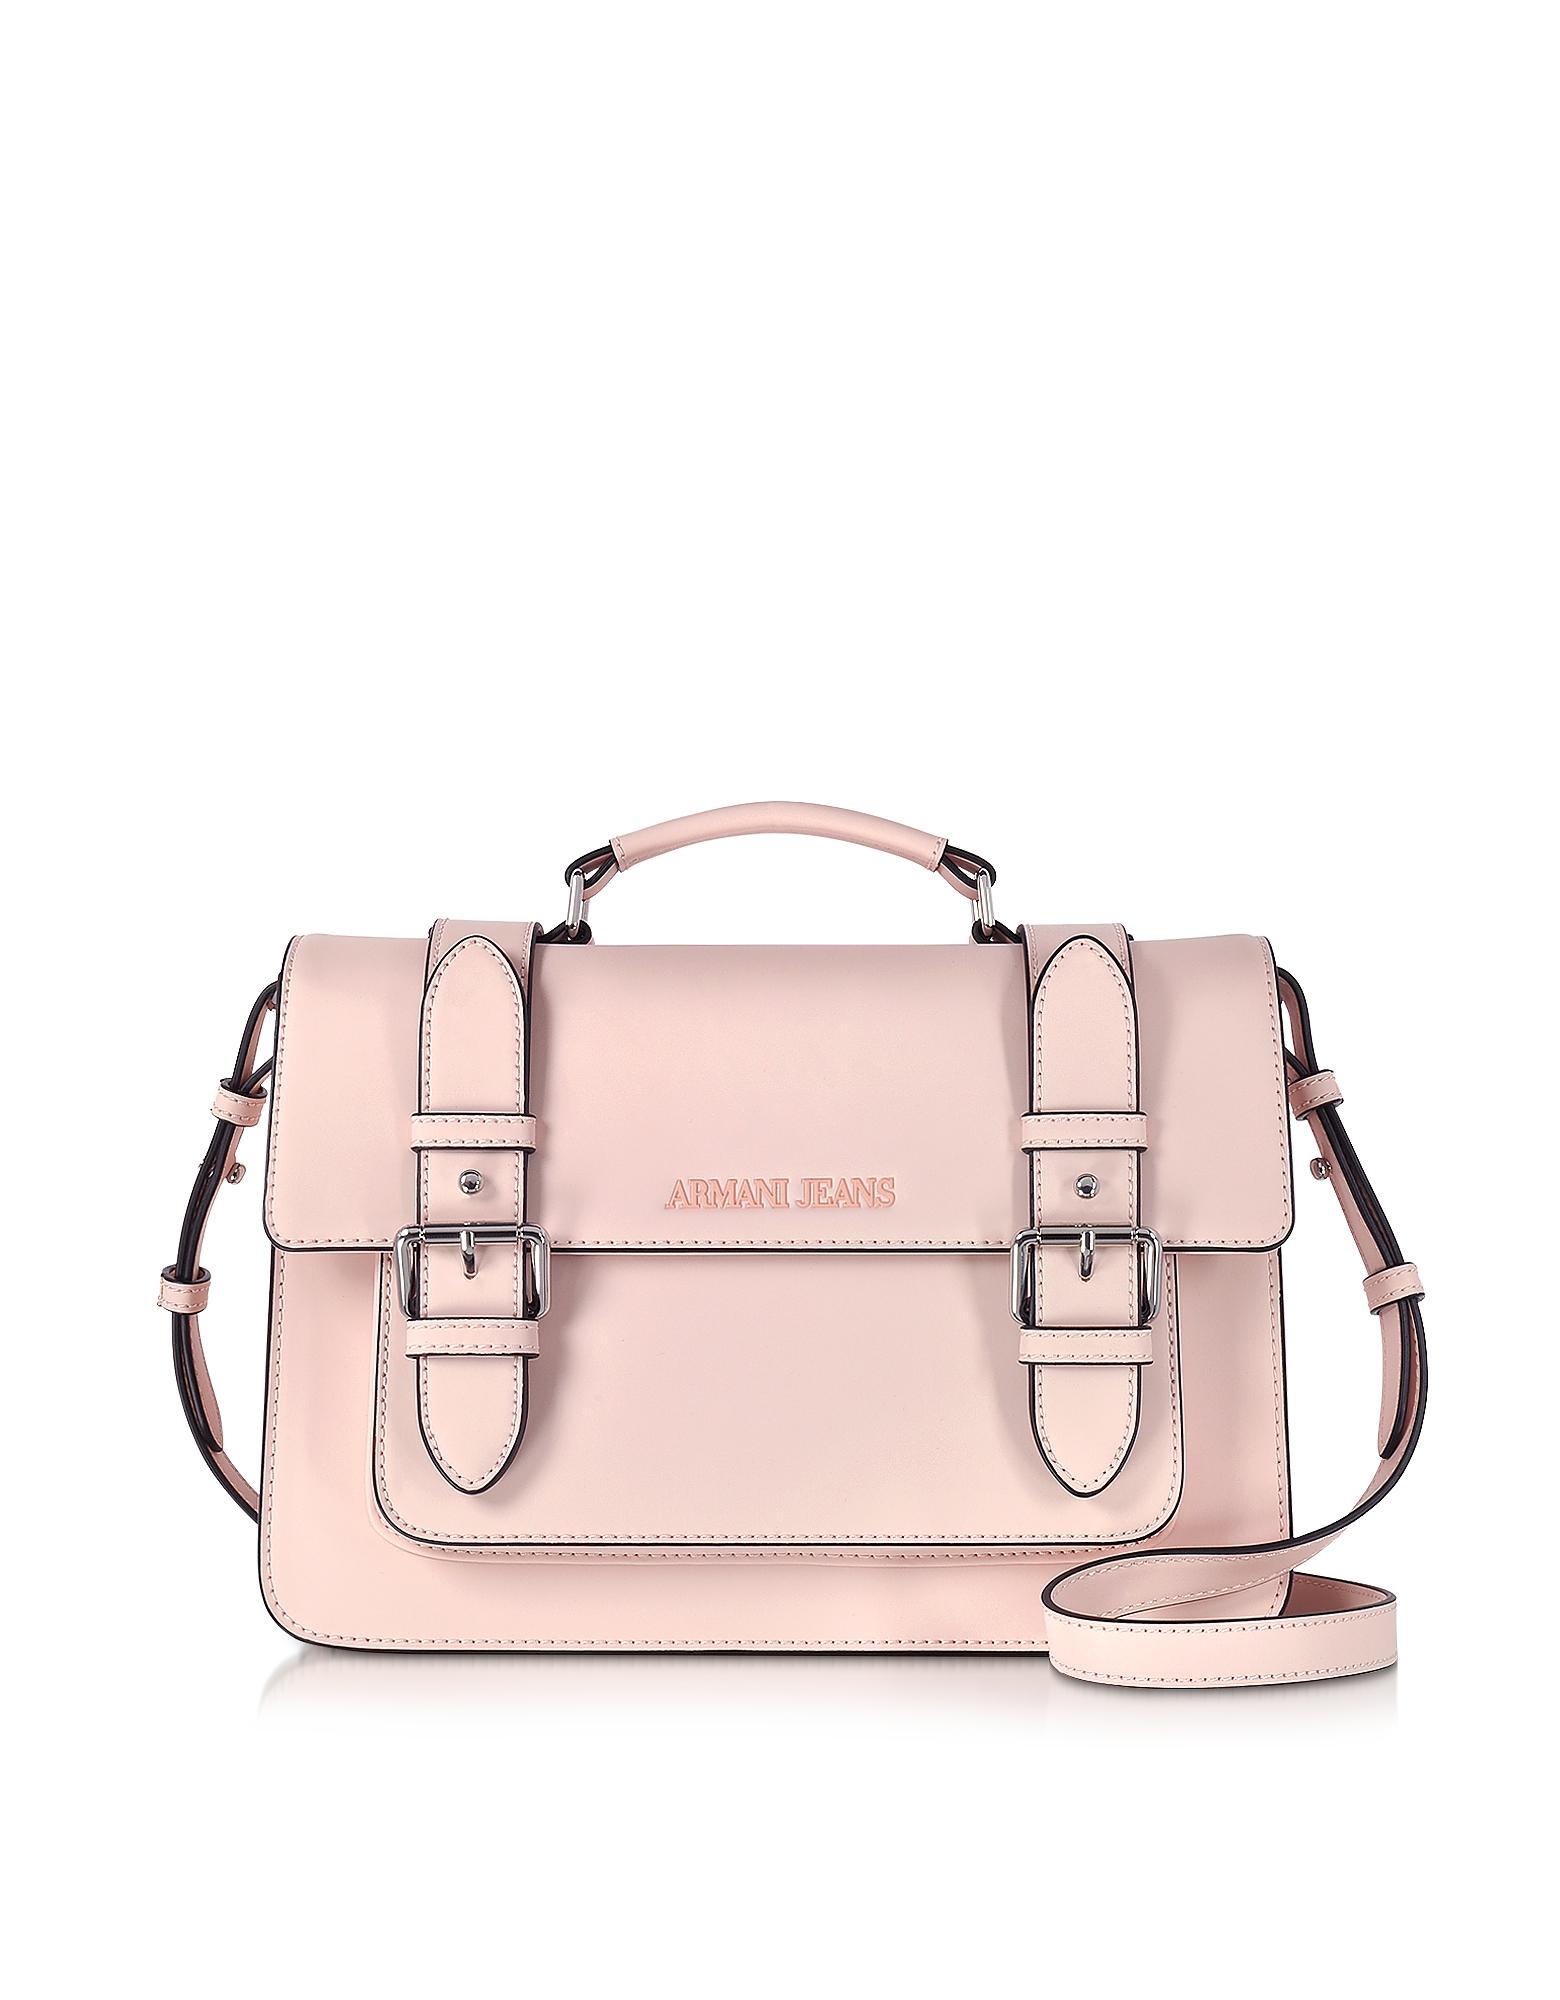 Armani Jeans Handbags, Eco Leather Medium Crossbody Bag